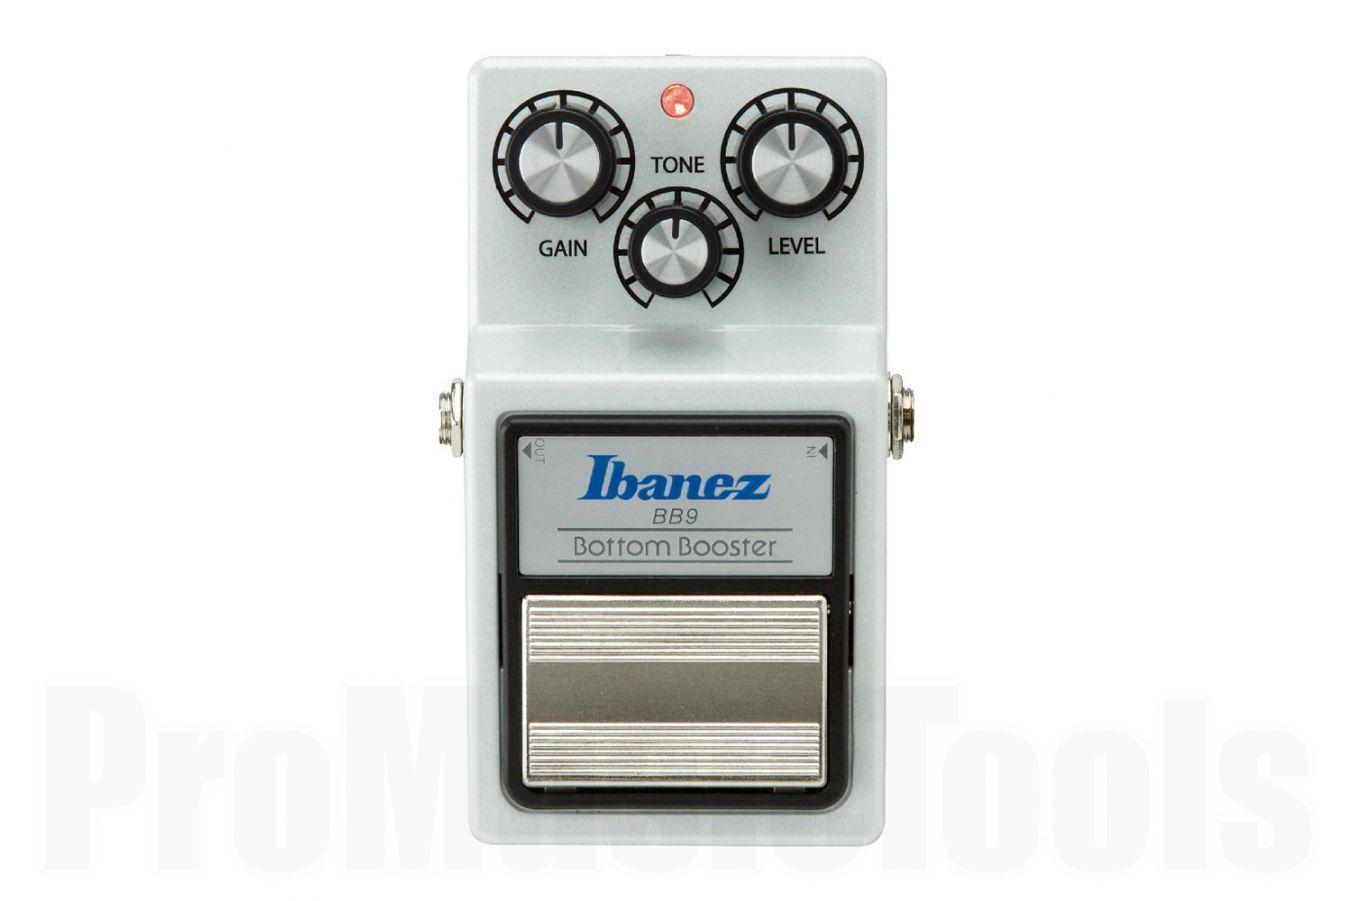 Ibanez BB9 Bottom Boost - demo